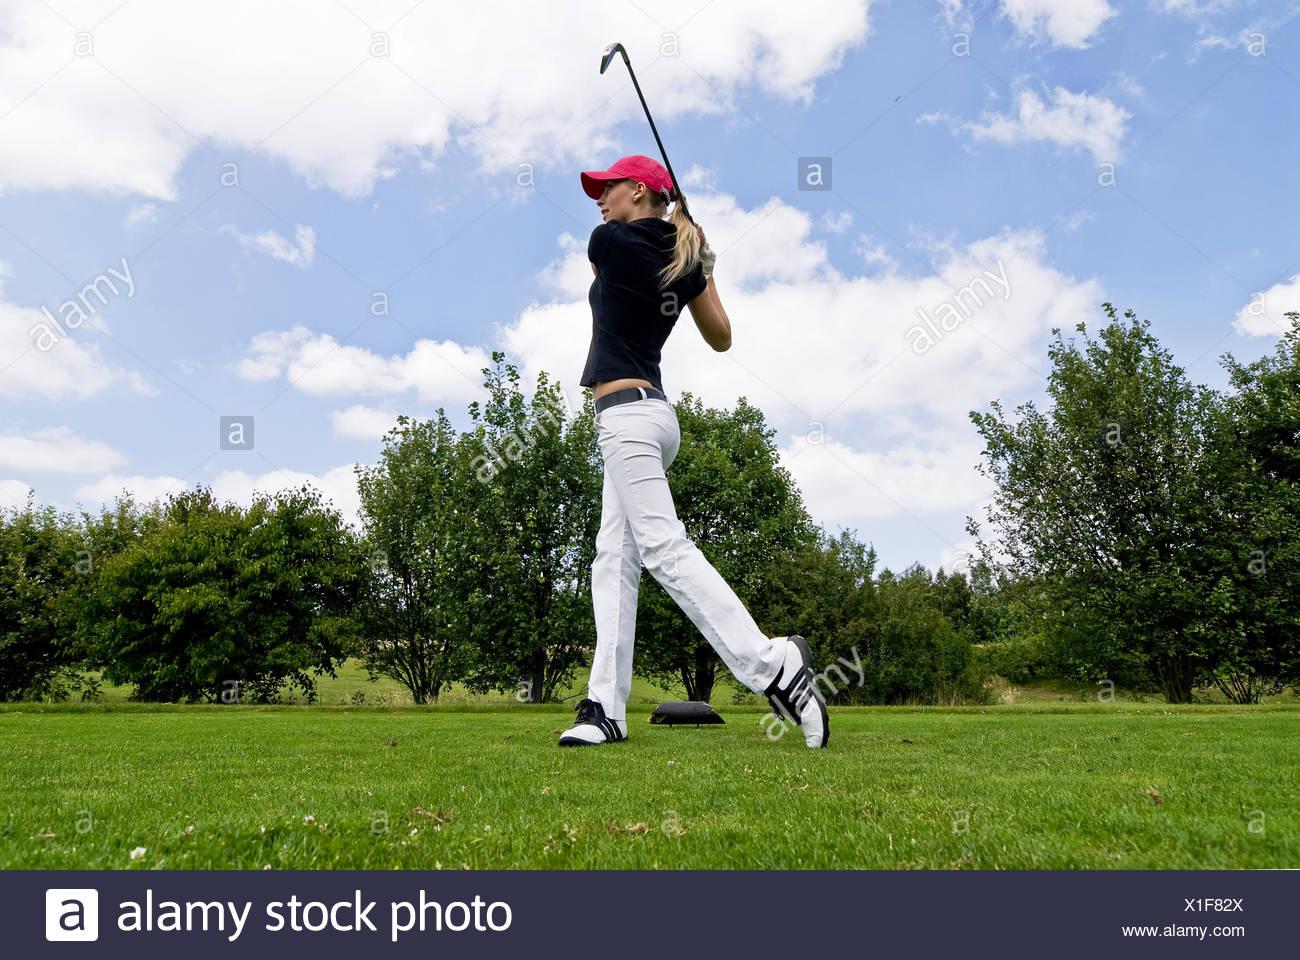 jugador de golf Imagen De Stock